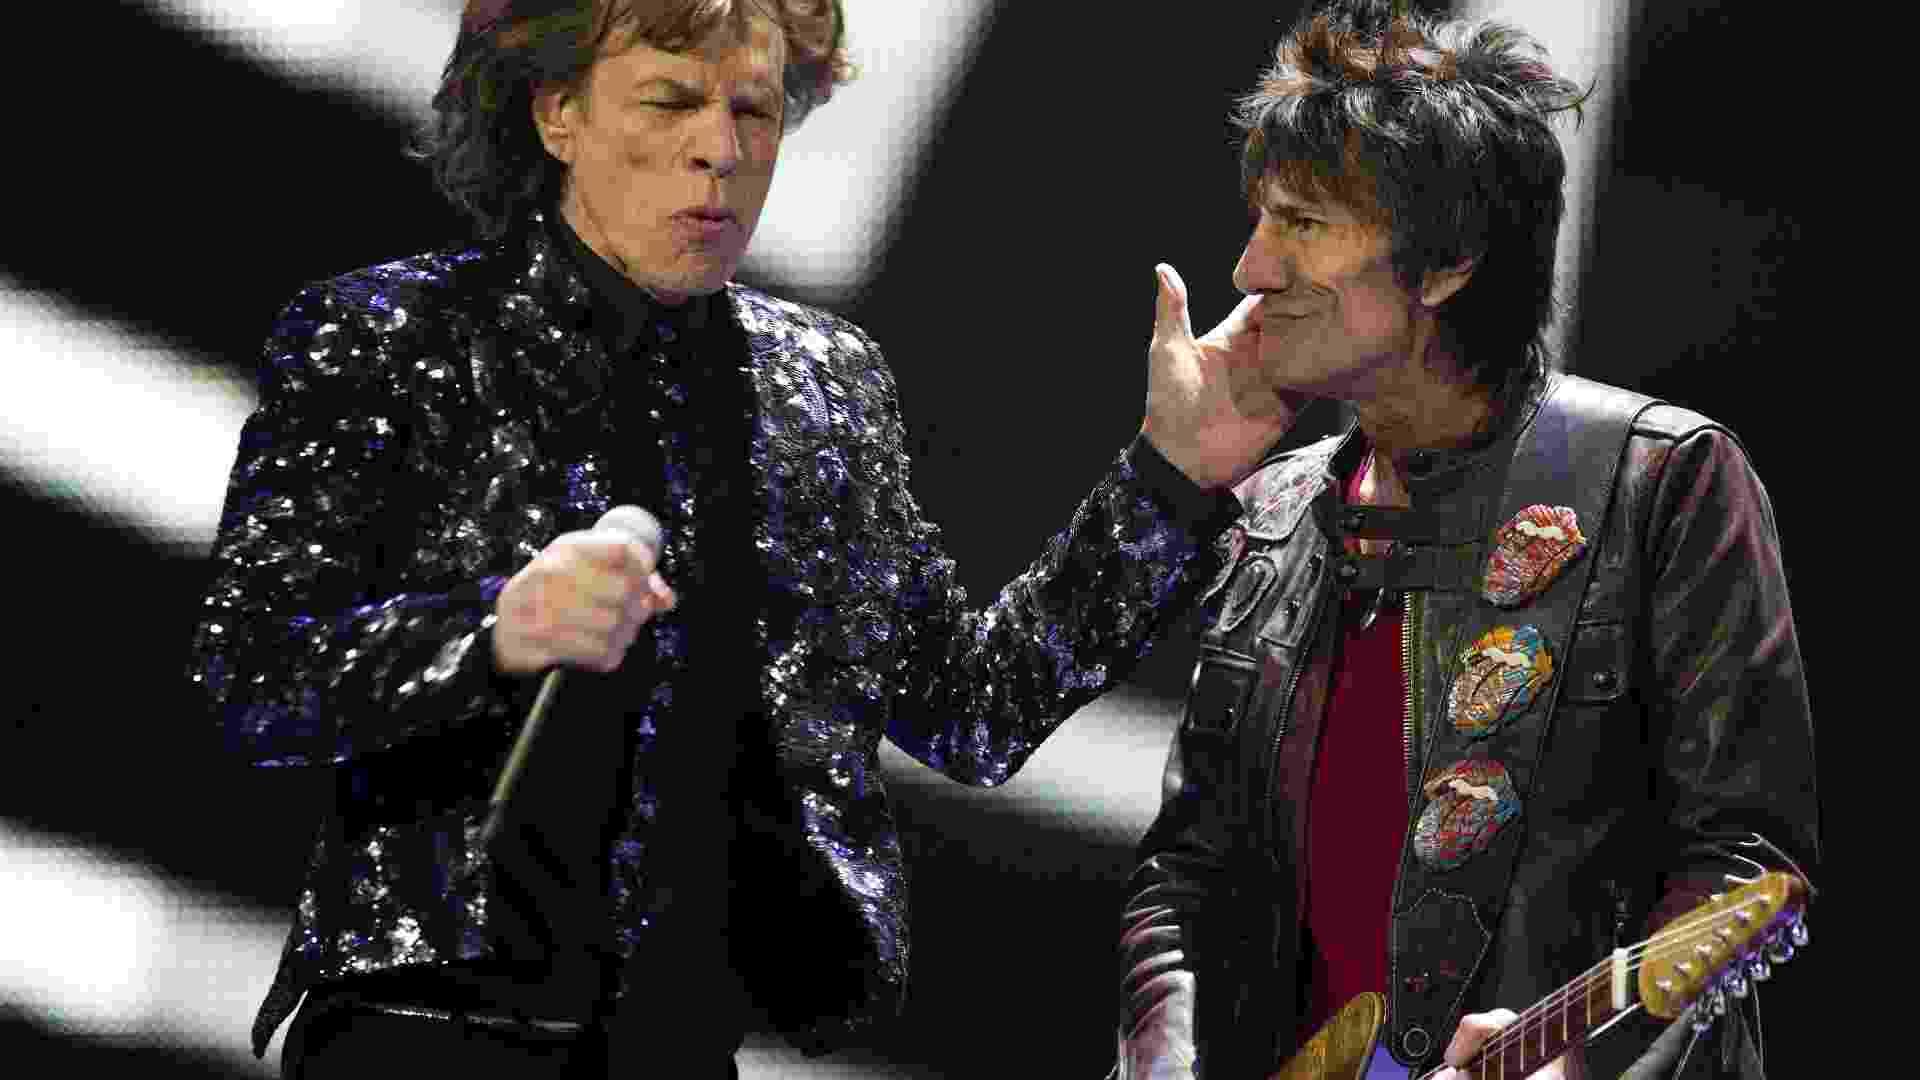 8.dez.2012 - Ronnie Wood e Mick Jagger, dos Rolling Stones, se apresentam no Barclays Center, em Nova York - Don Emmert/AFP